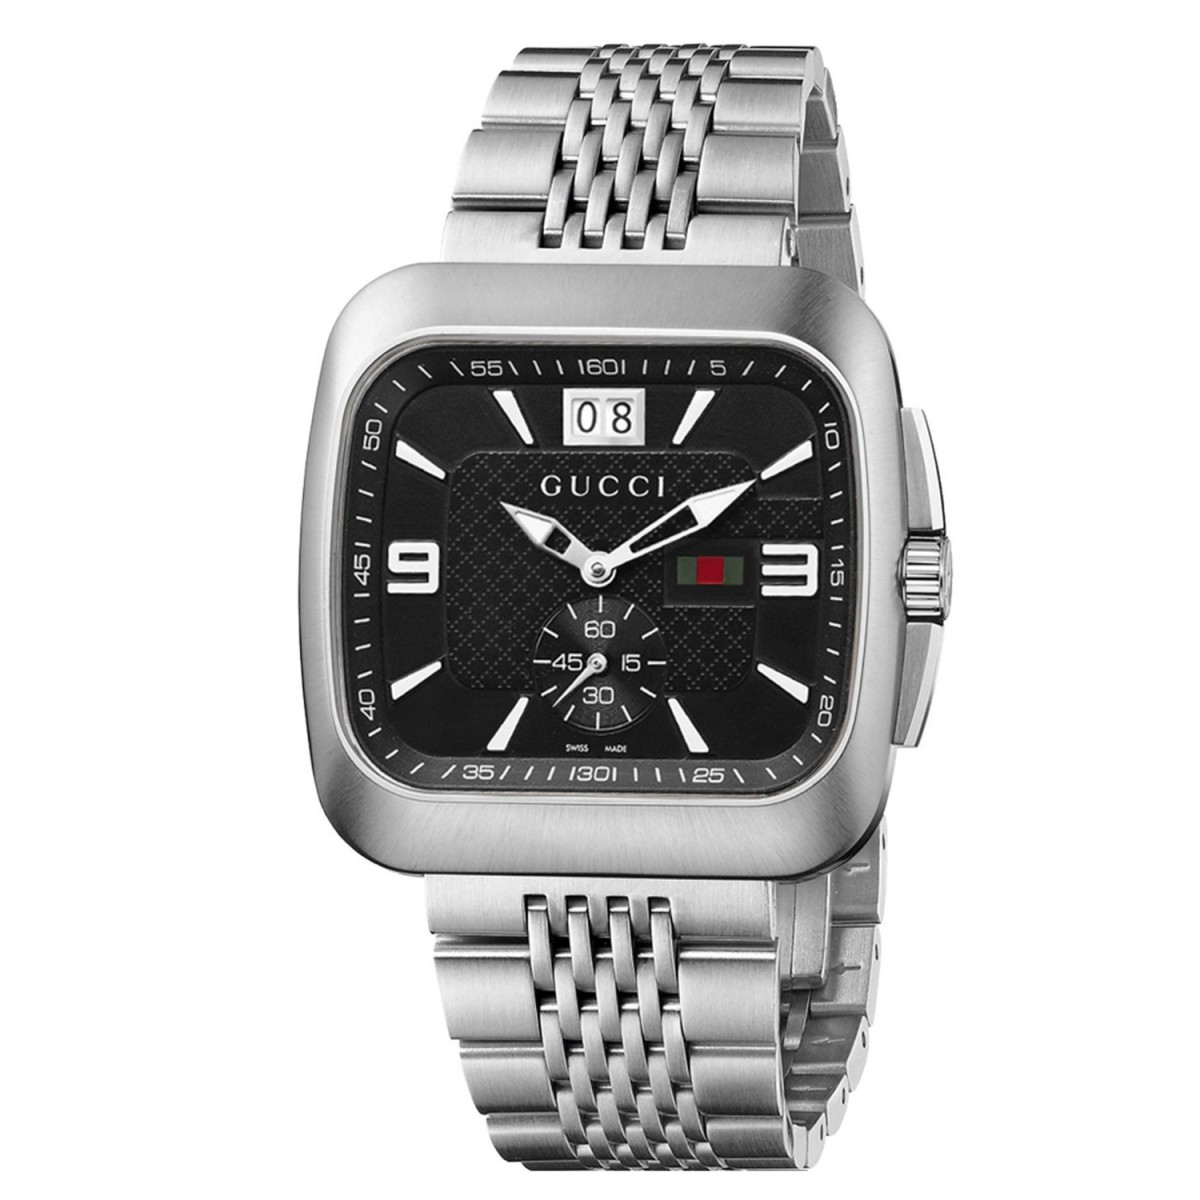 5bac4c5f9c4 Compre Relógio Gucci Coupè em 10X